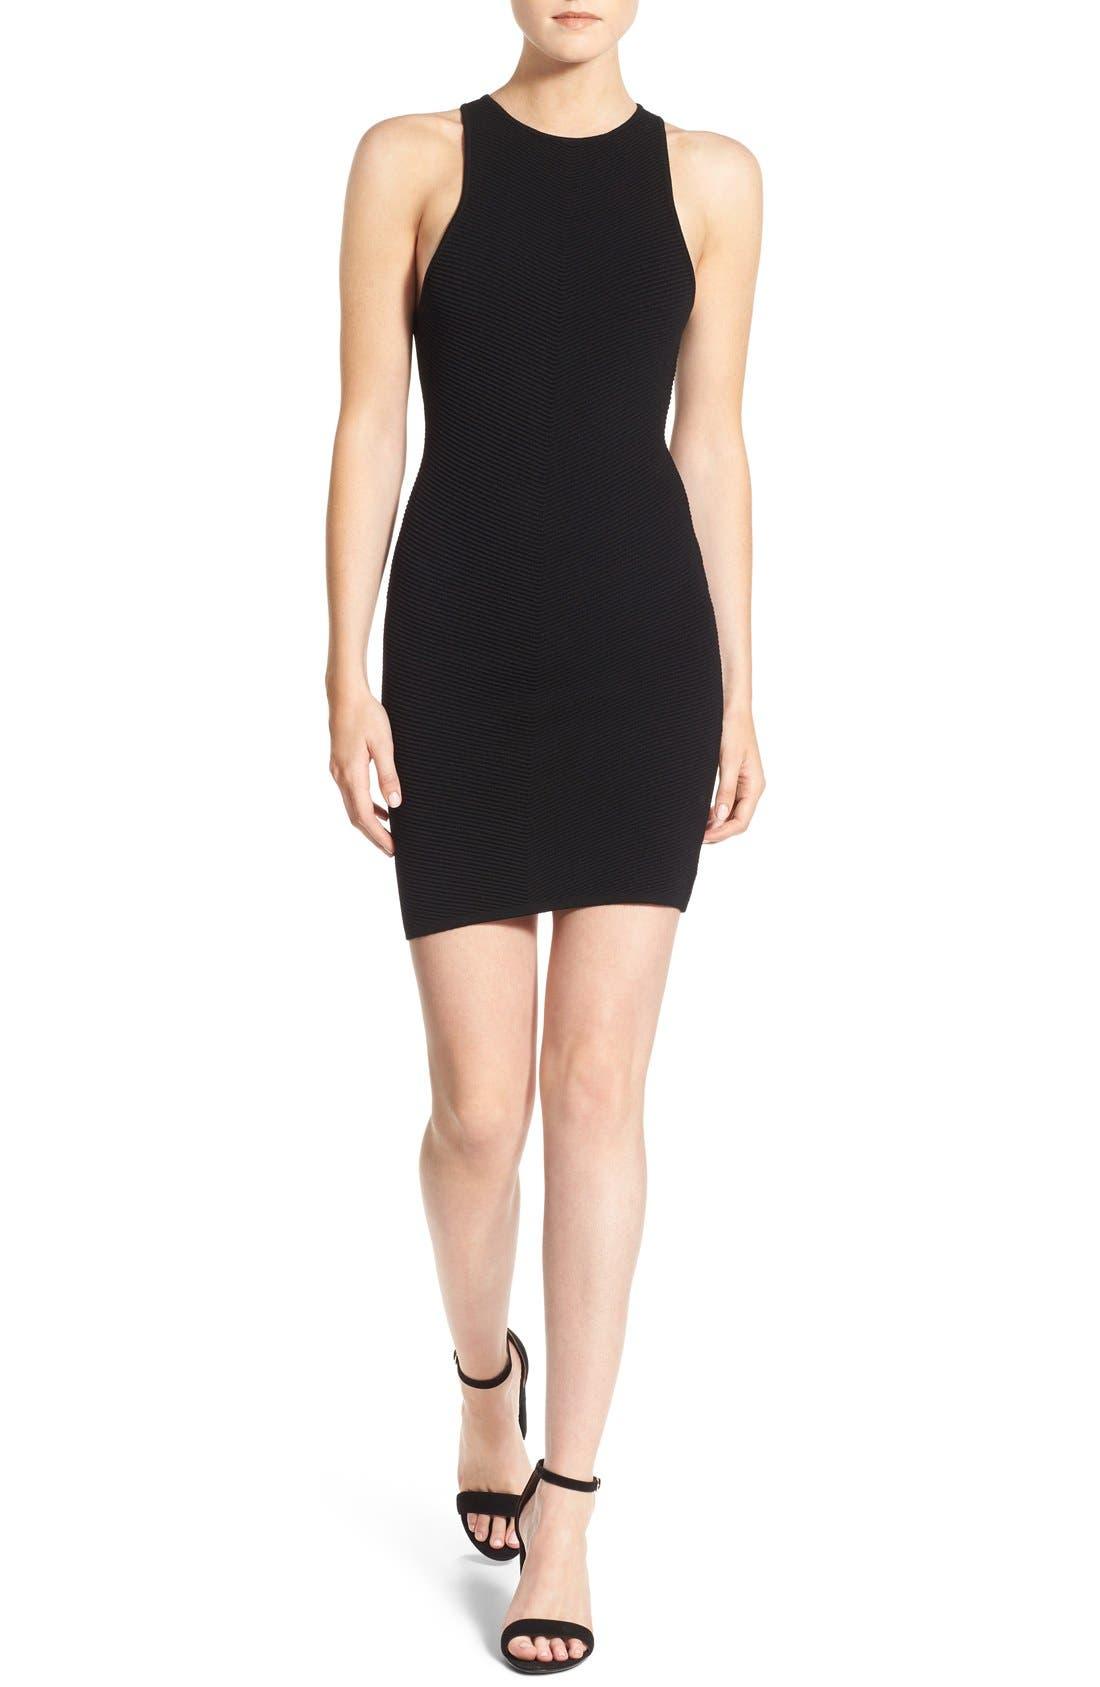 Alternate Image 1 Selected - Rebecca Minkoff 'Jenn' Body-Con Dress